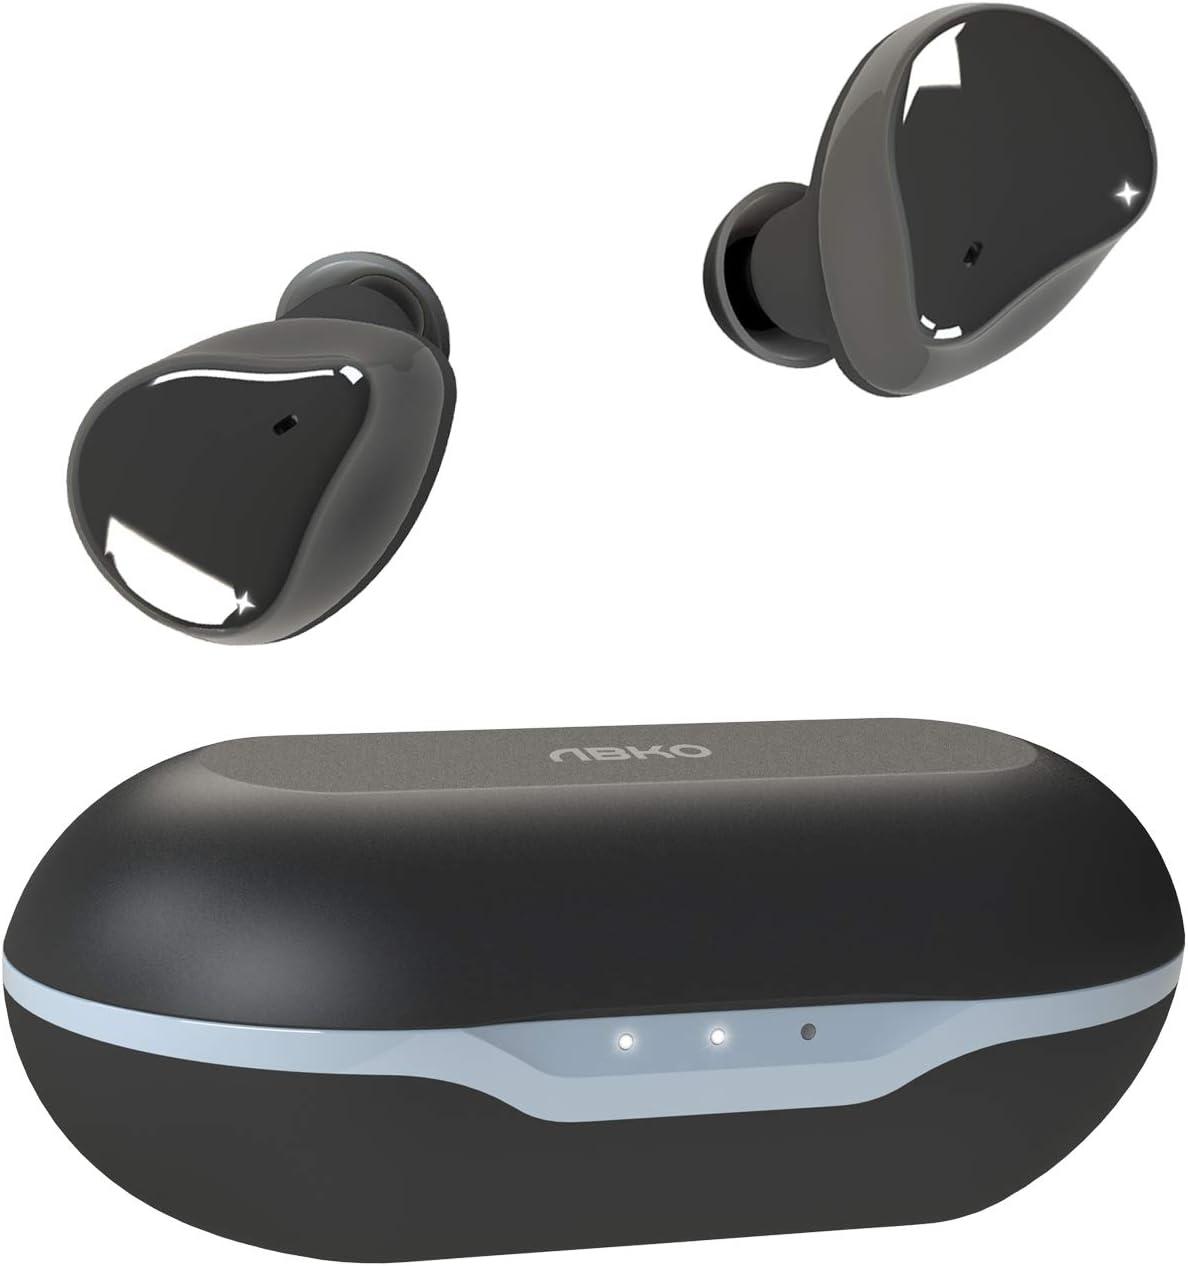 ABKO True Wireless Earbuds Graphene Dynamic Driver AptX Bluetooth in-Ear Headphones Wireless Charging Case Unique Design USB-C IPX5 Waterproof EF02 Black